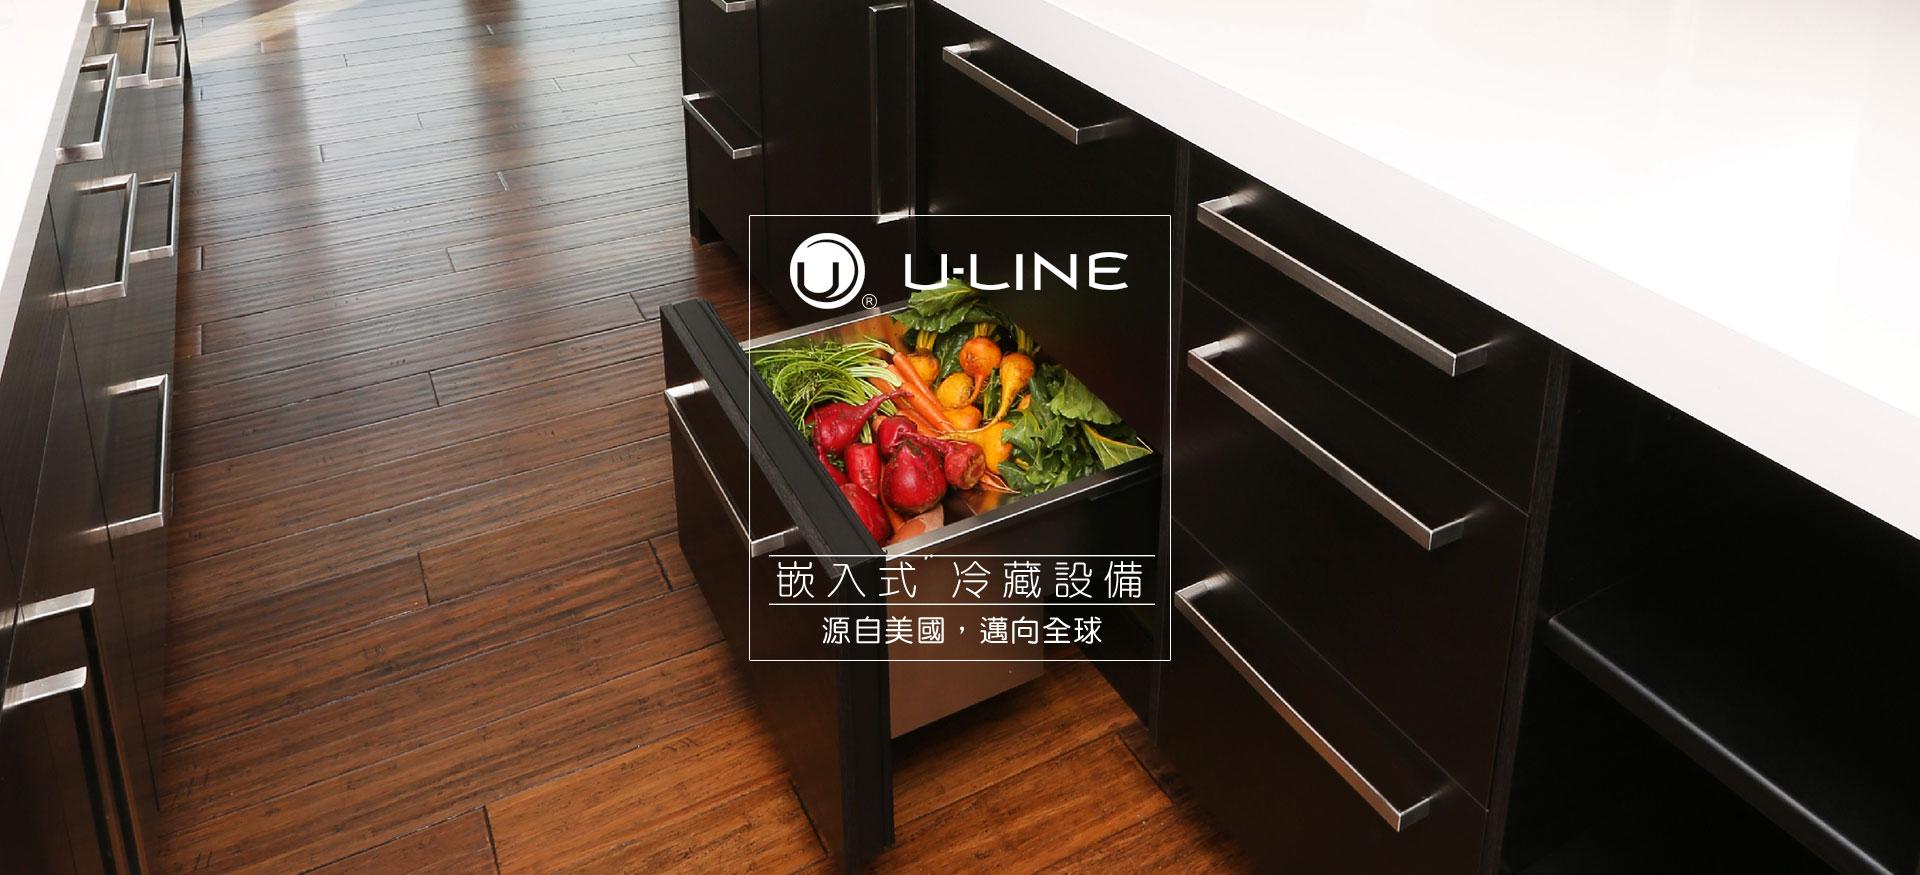 U-Line 冷藏設備